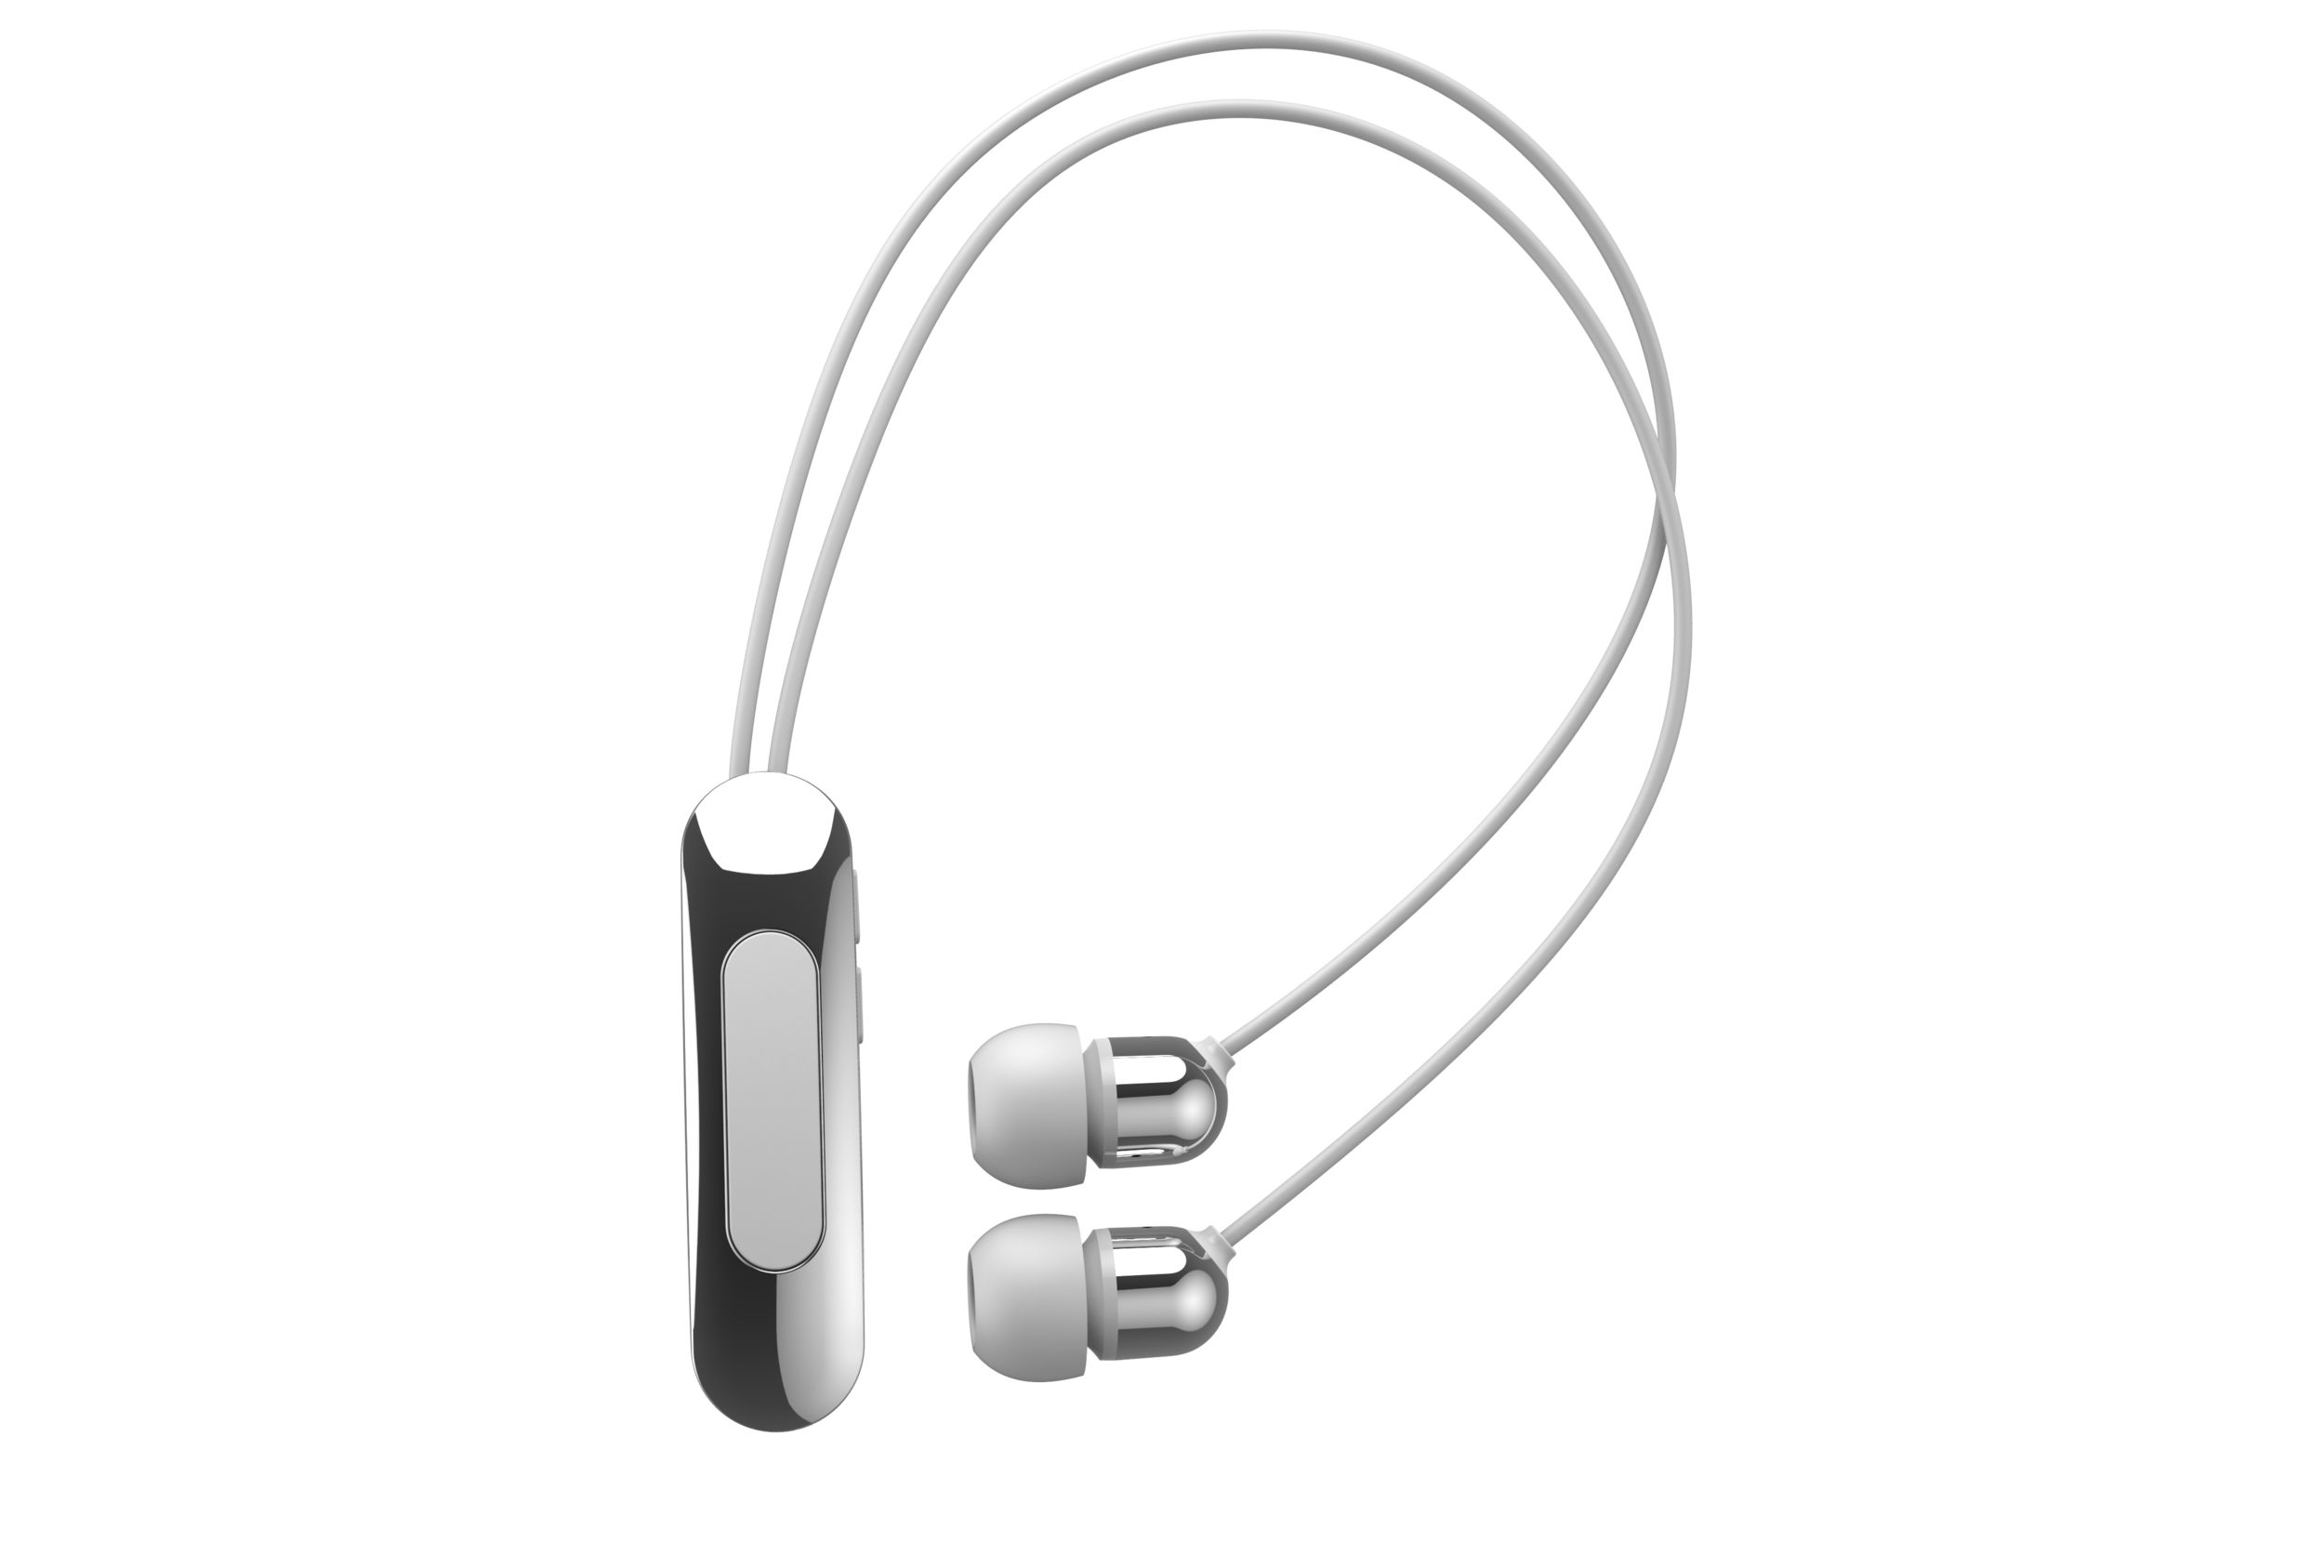 helix-headset-whitesilver-4.png